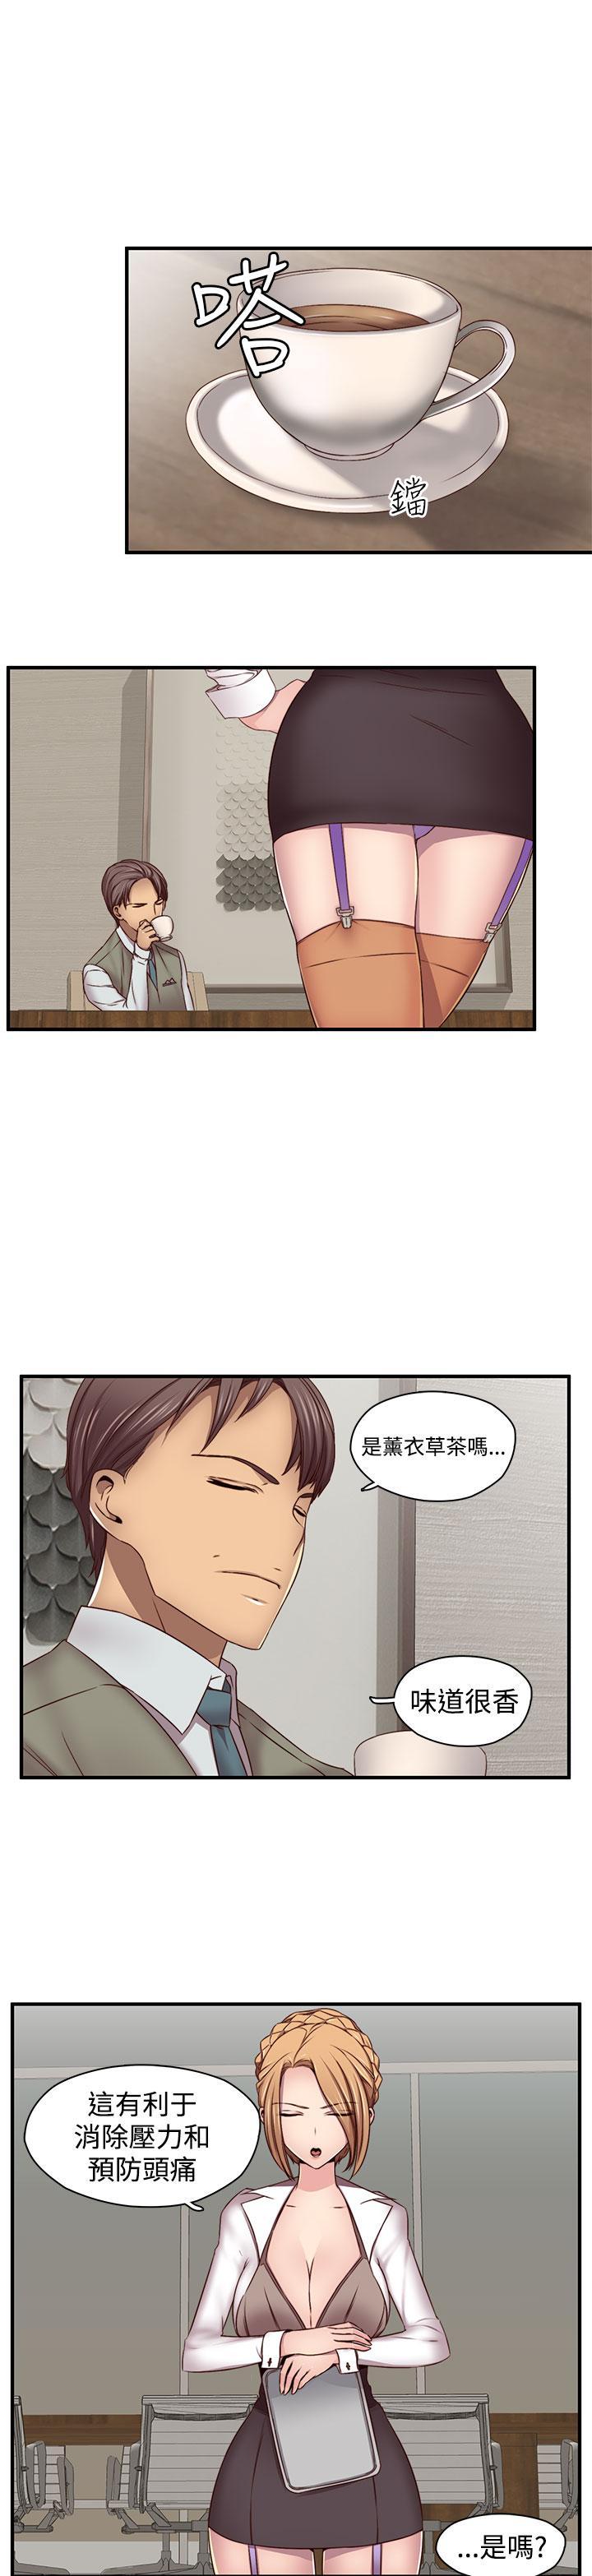 [Dasum & Puutaro] H-Campus H校园<第2季> ch.41-46 (chinese) 80